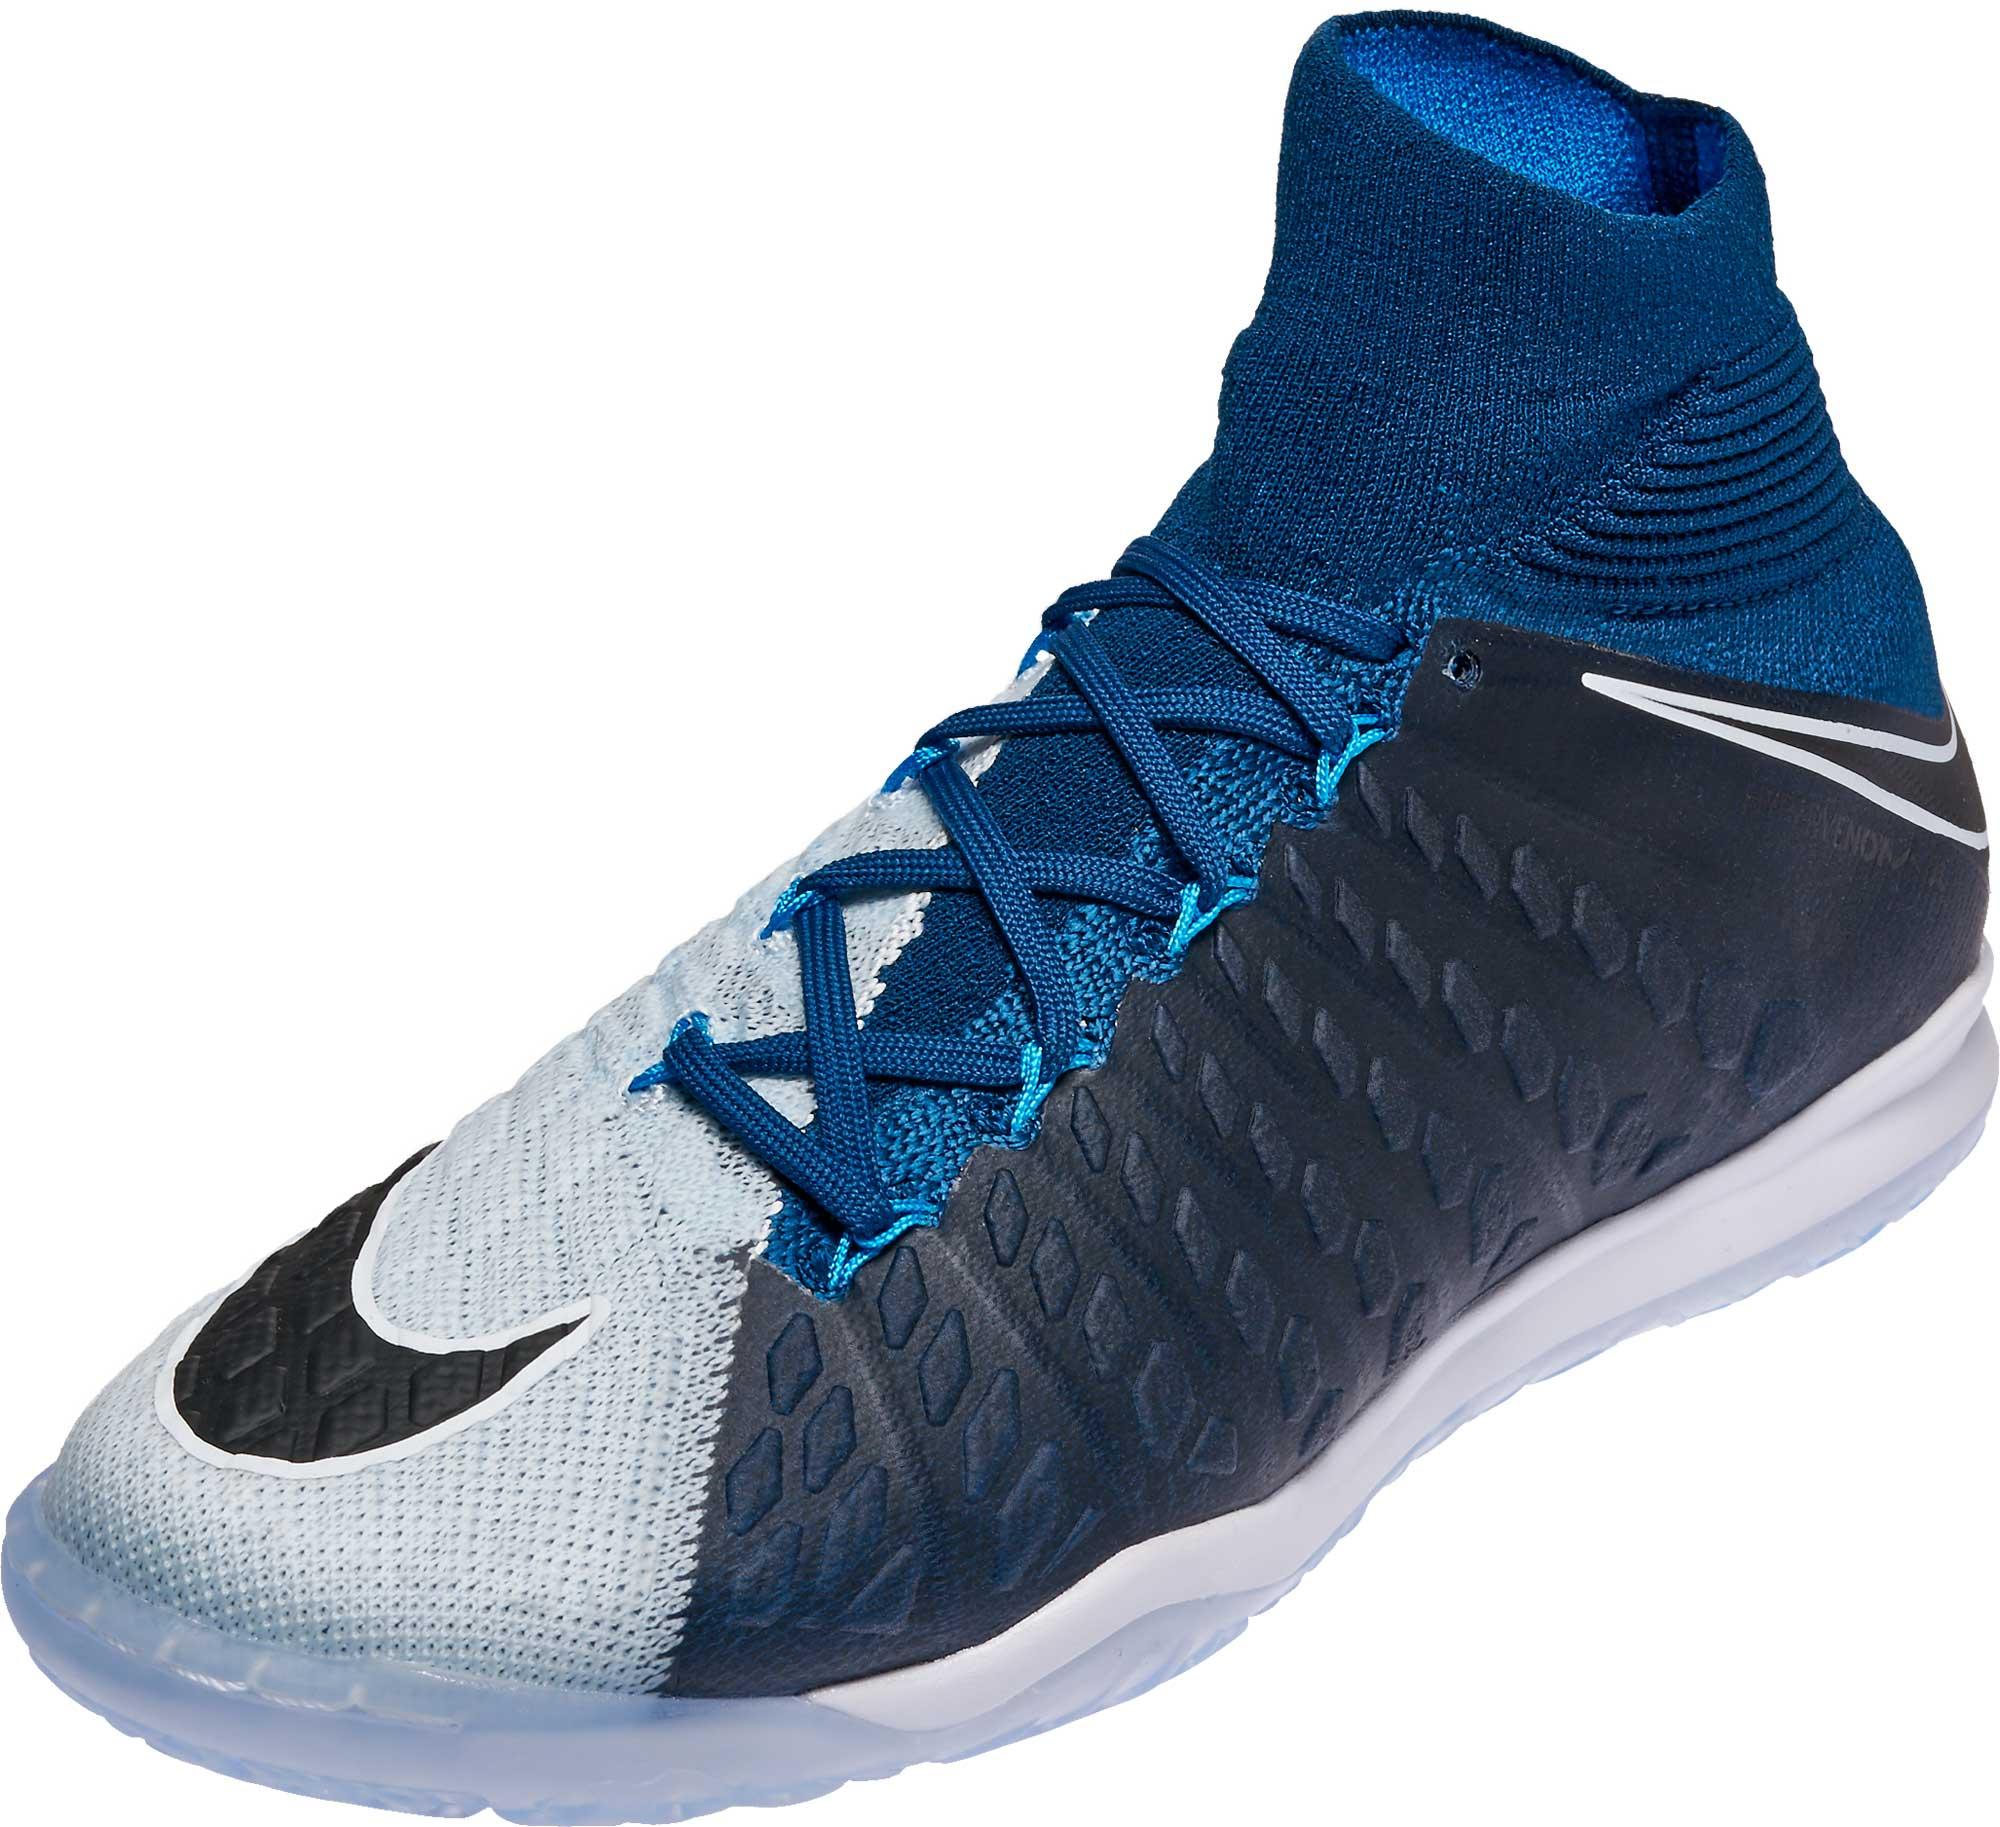 622bd2f95 Nike HypervenomX Proximo II DF IC Soccer Shoes – Brave Blue & Black.  CLEARANCE ...